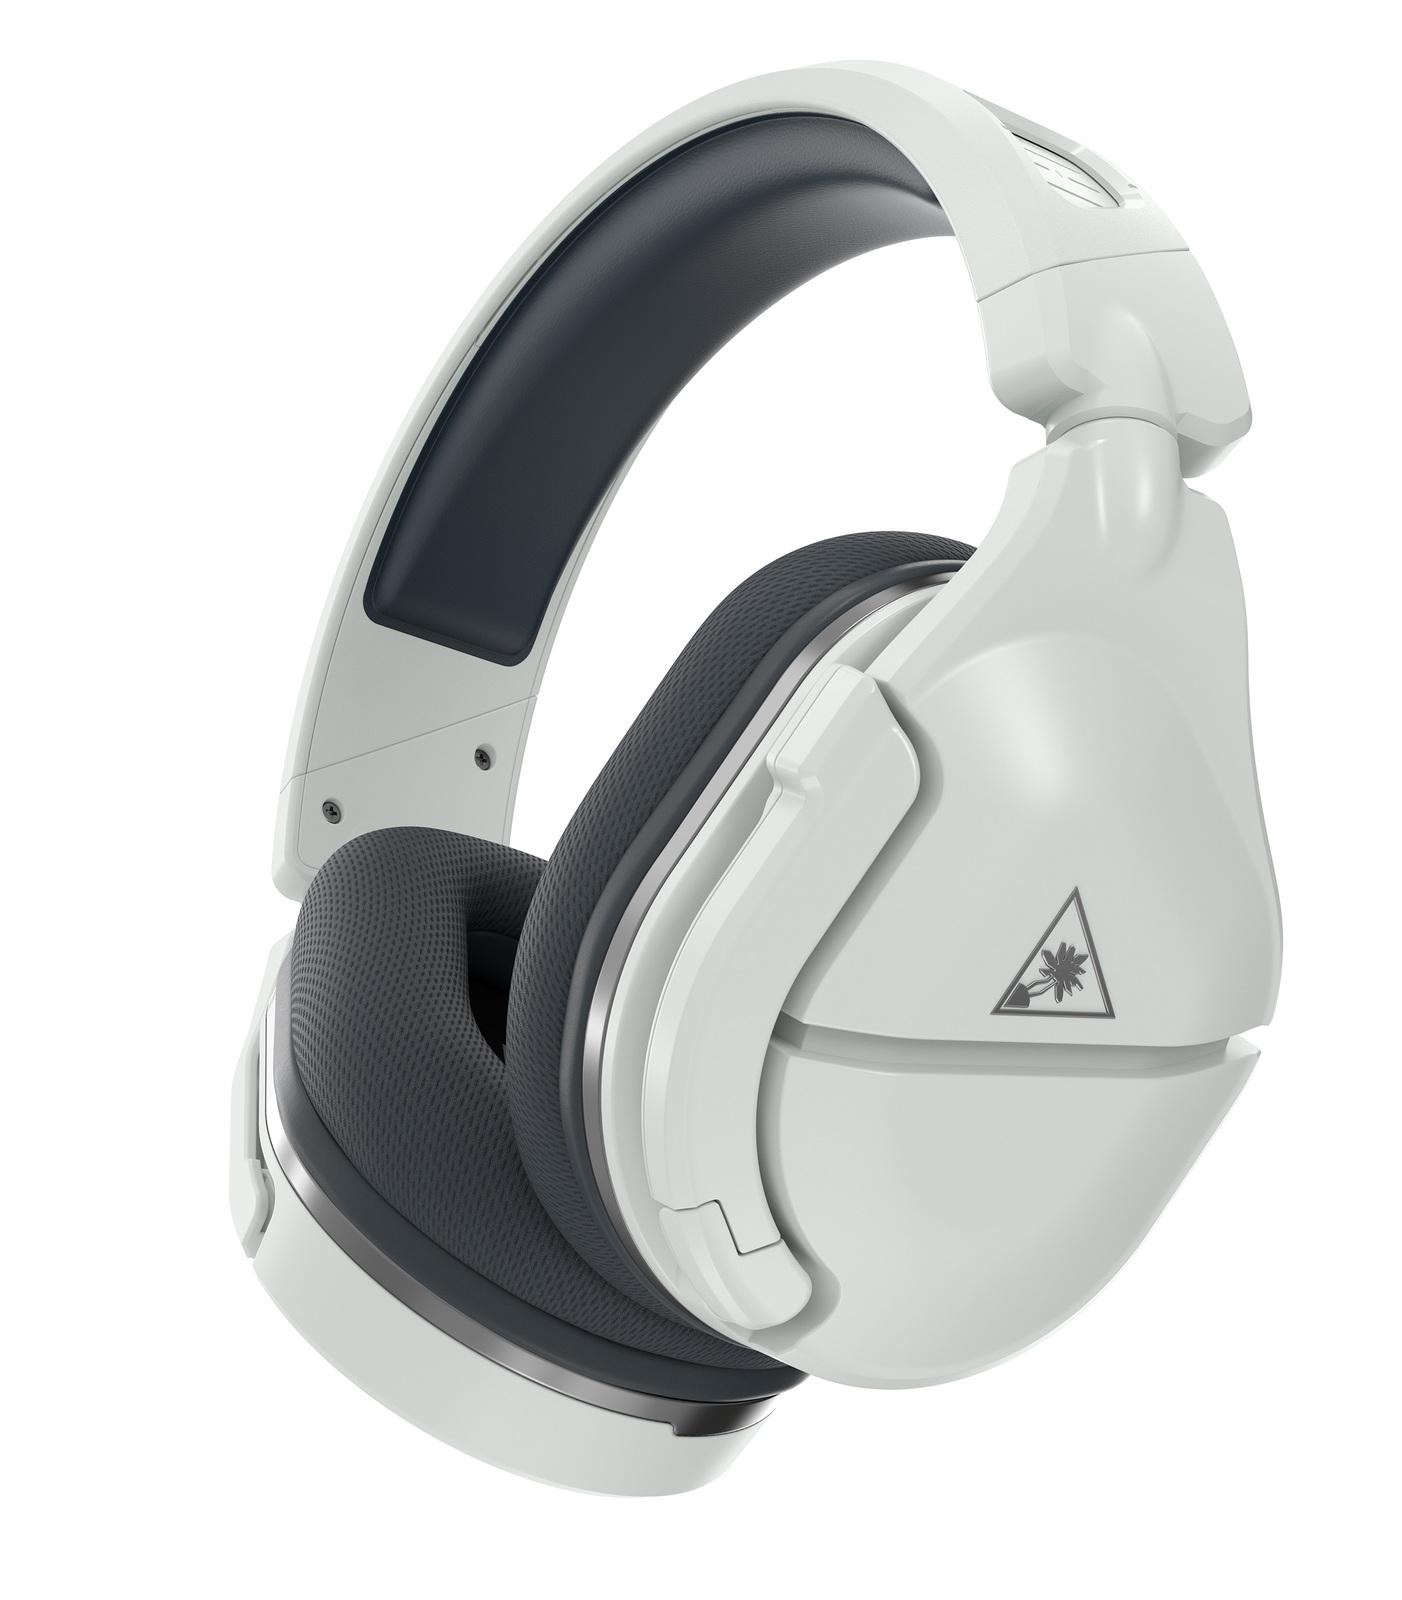 Turtle Beach Ear Force Stealth 600P Gen 2 Gaming Headset (White) screenshot